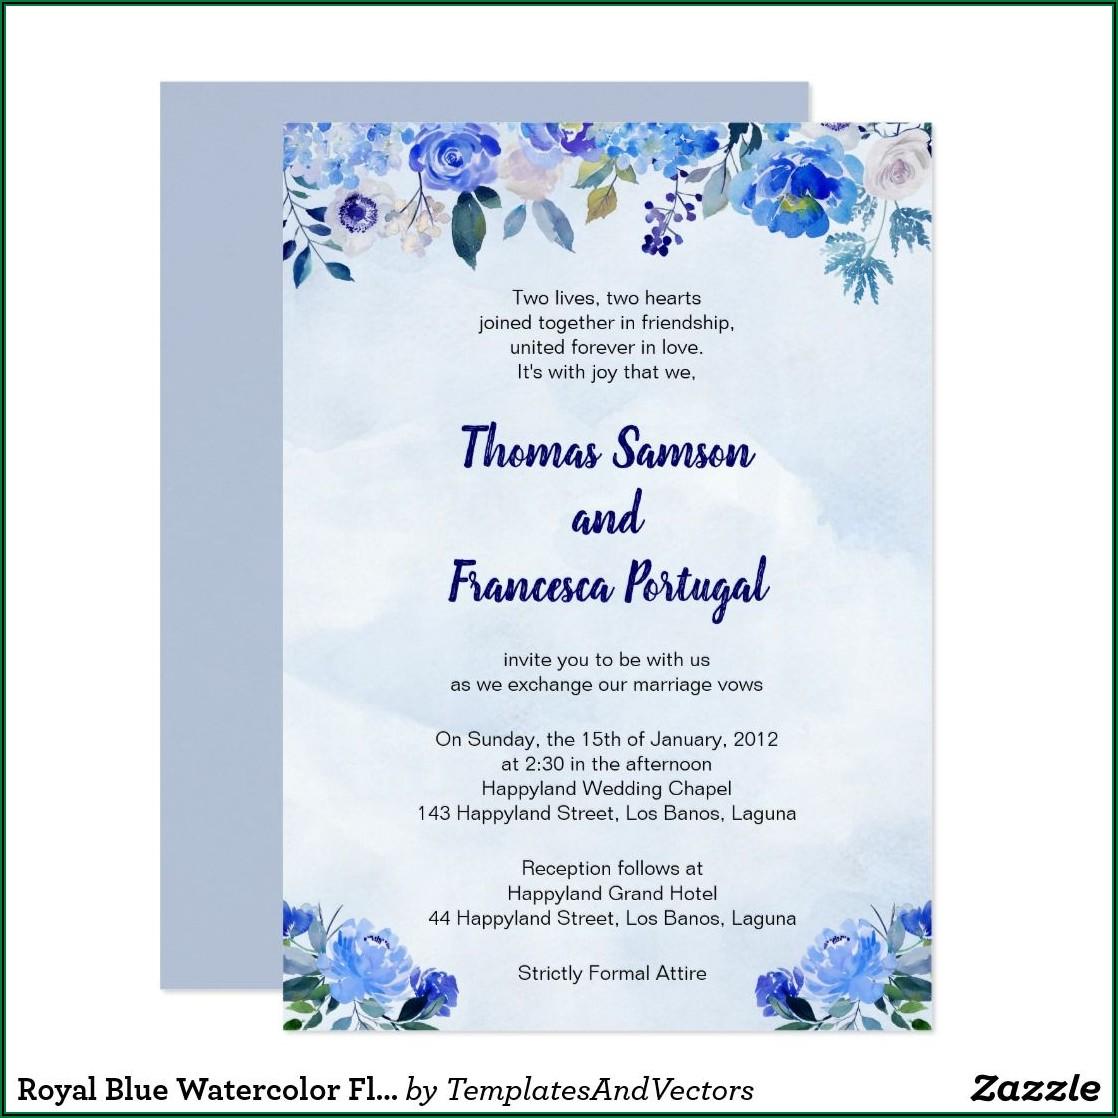 Royal Blue Wedding Invitation Layout